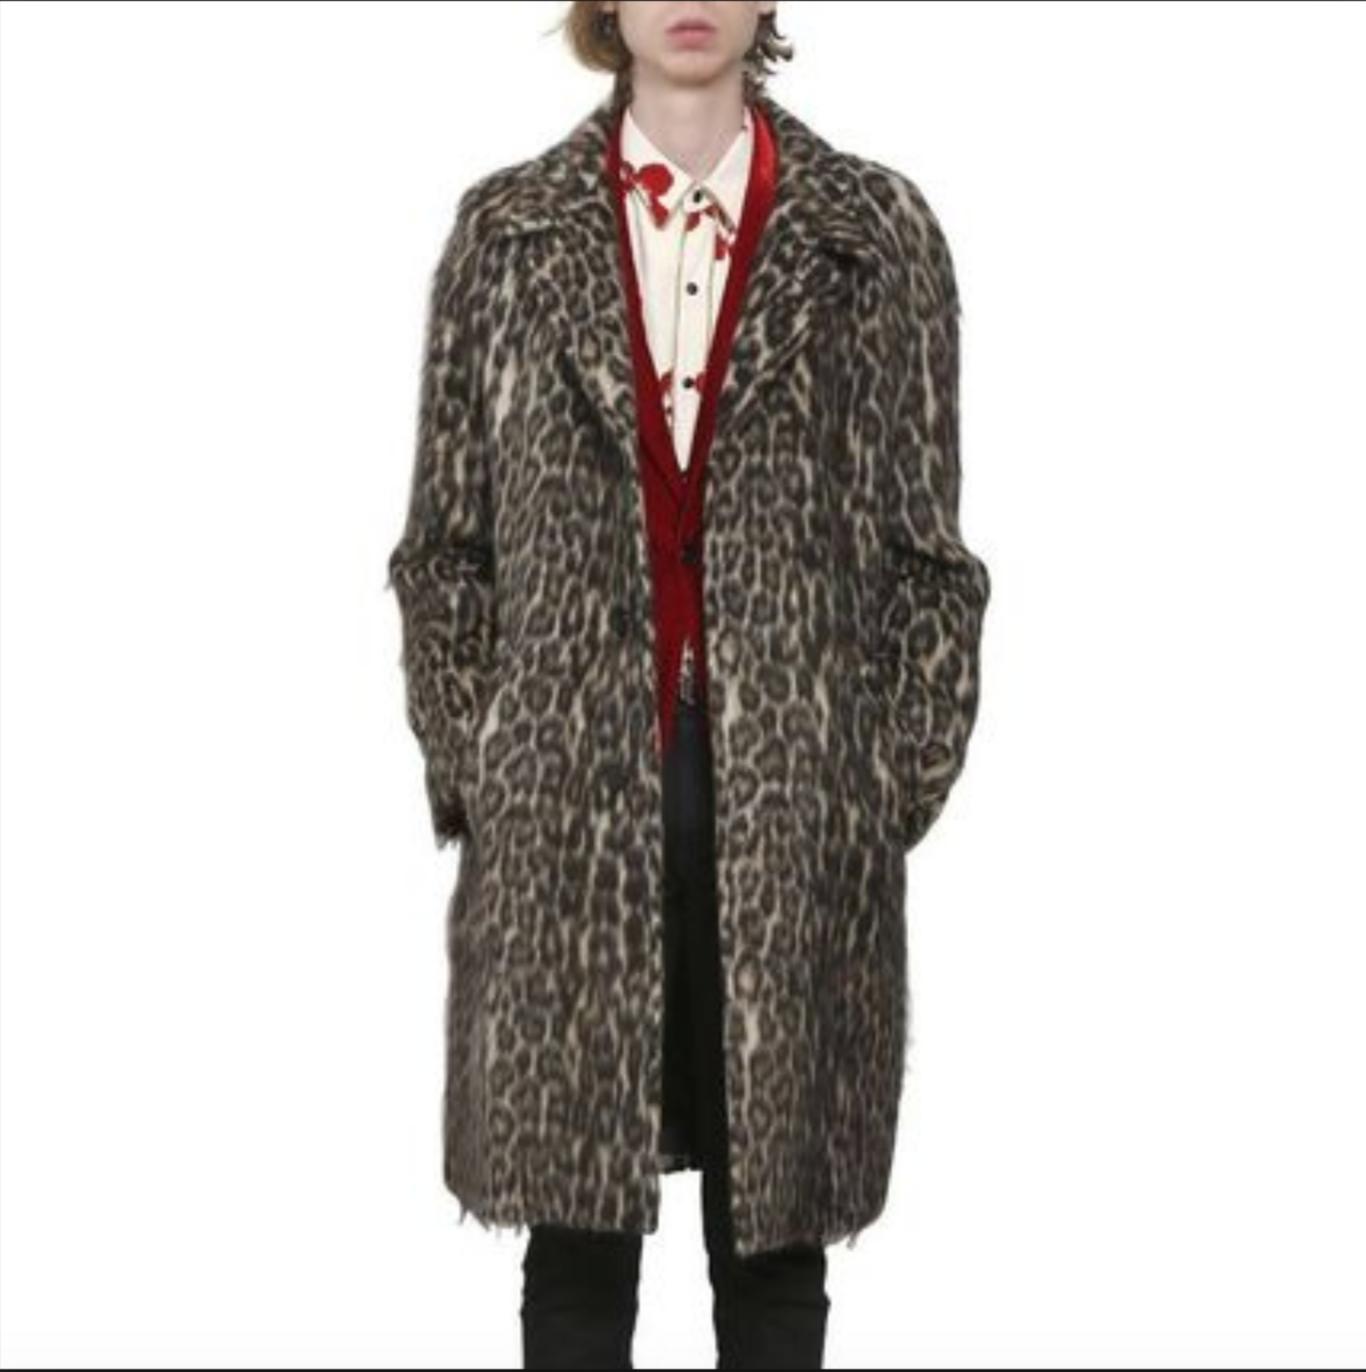 a4187b48885f Saint Laurent Paris Fw16 Leopard Print Wool Coat Sz 46 Hedi Slimane ...